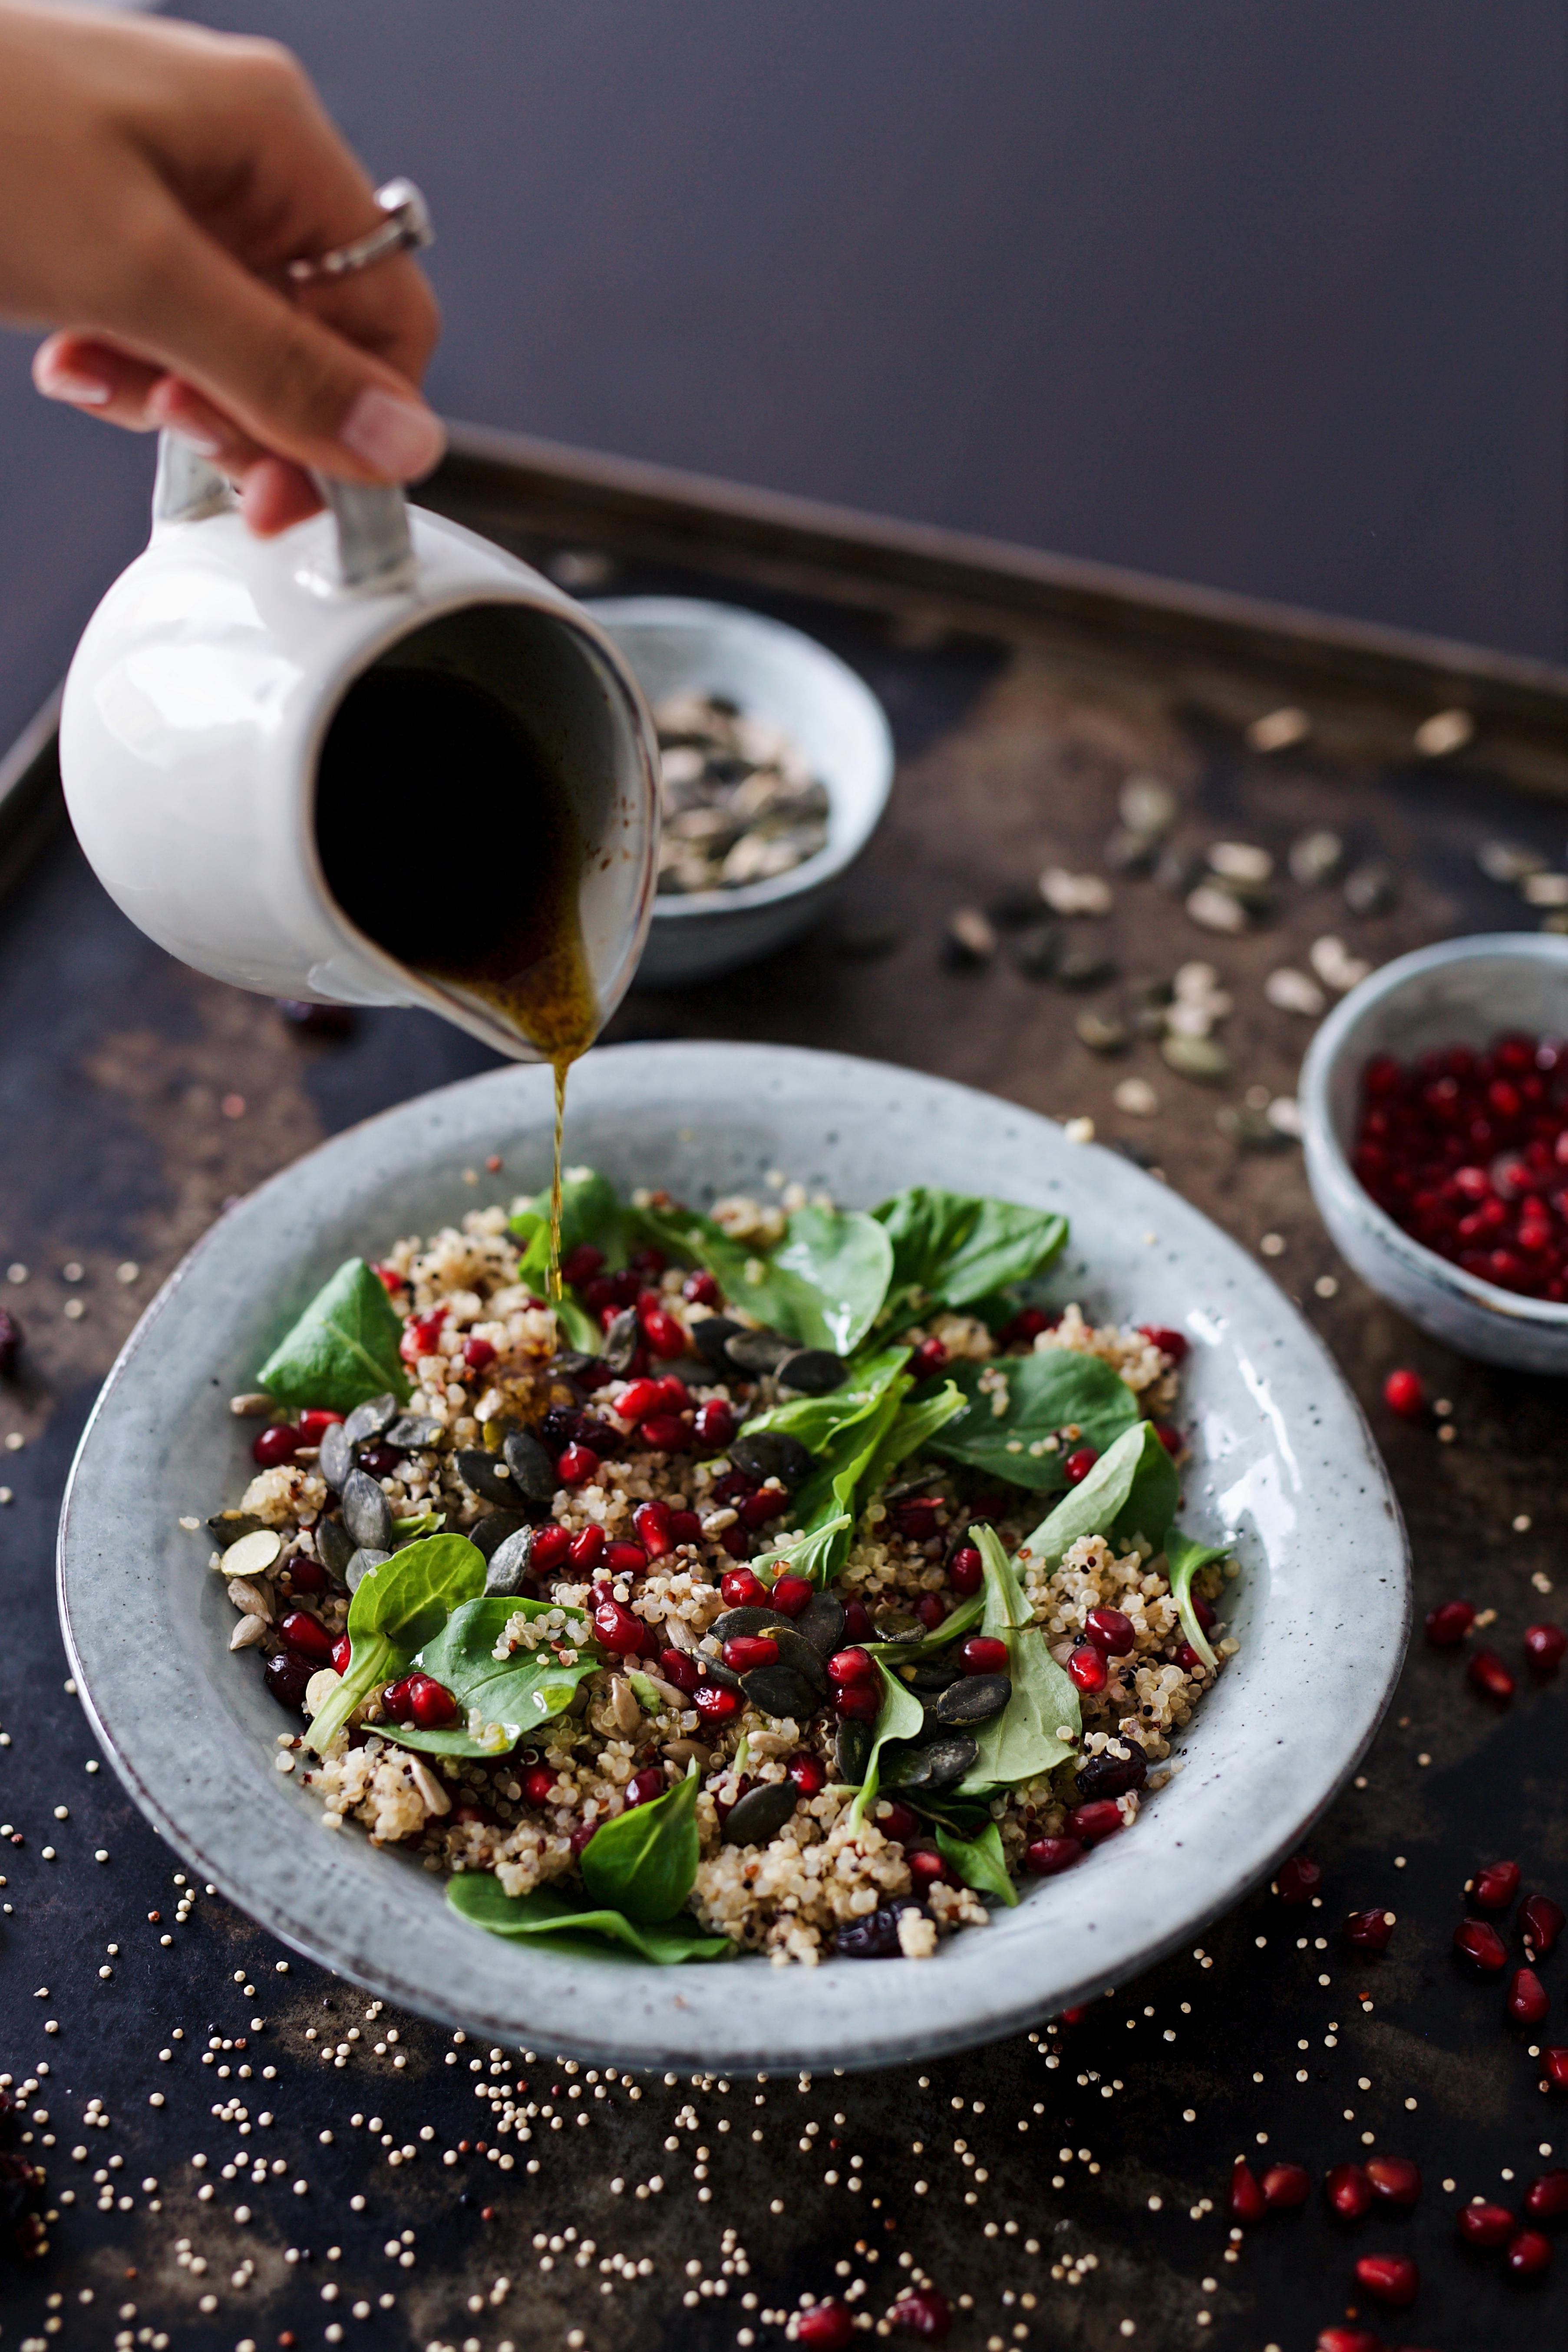 Quinoasalat mit Cranberries und Granatapfel vegan